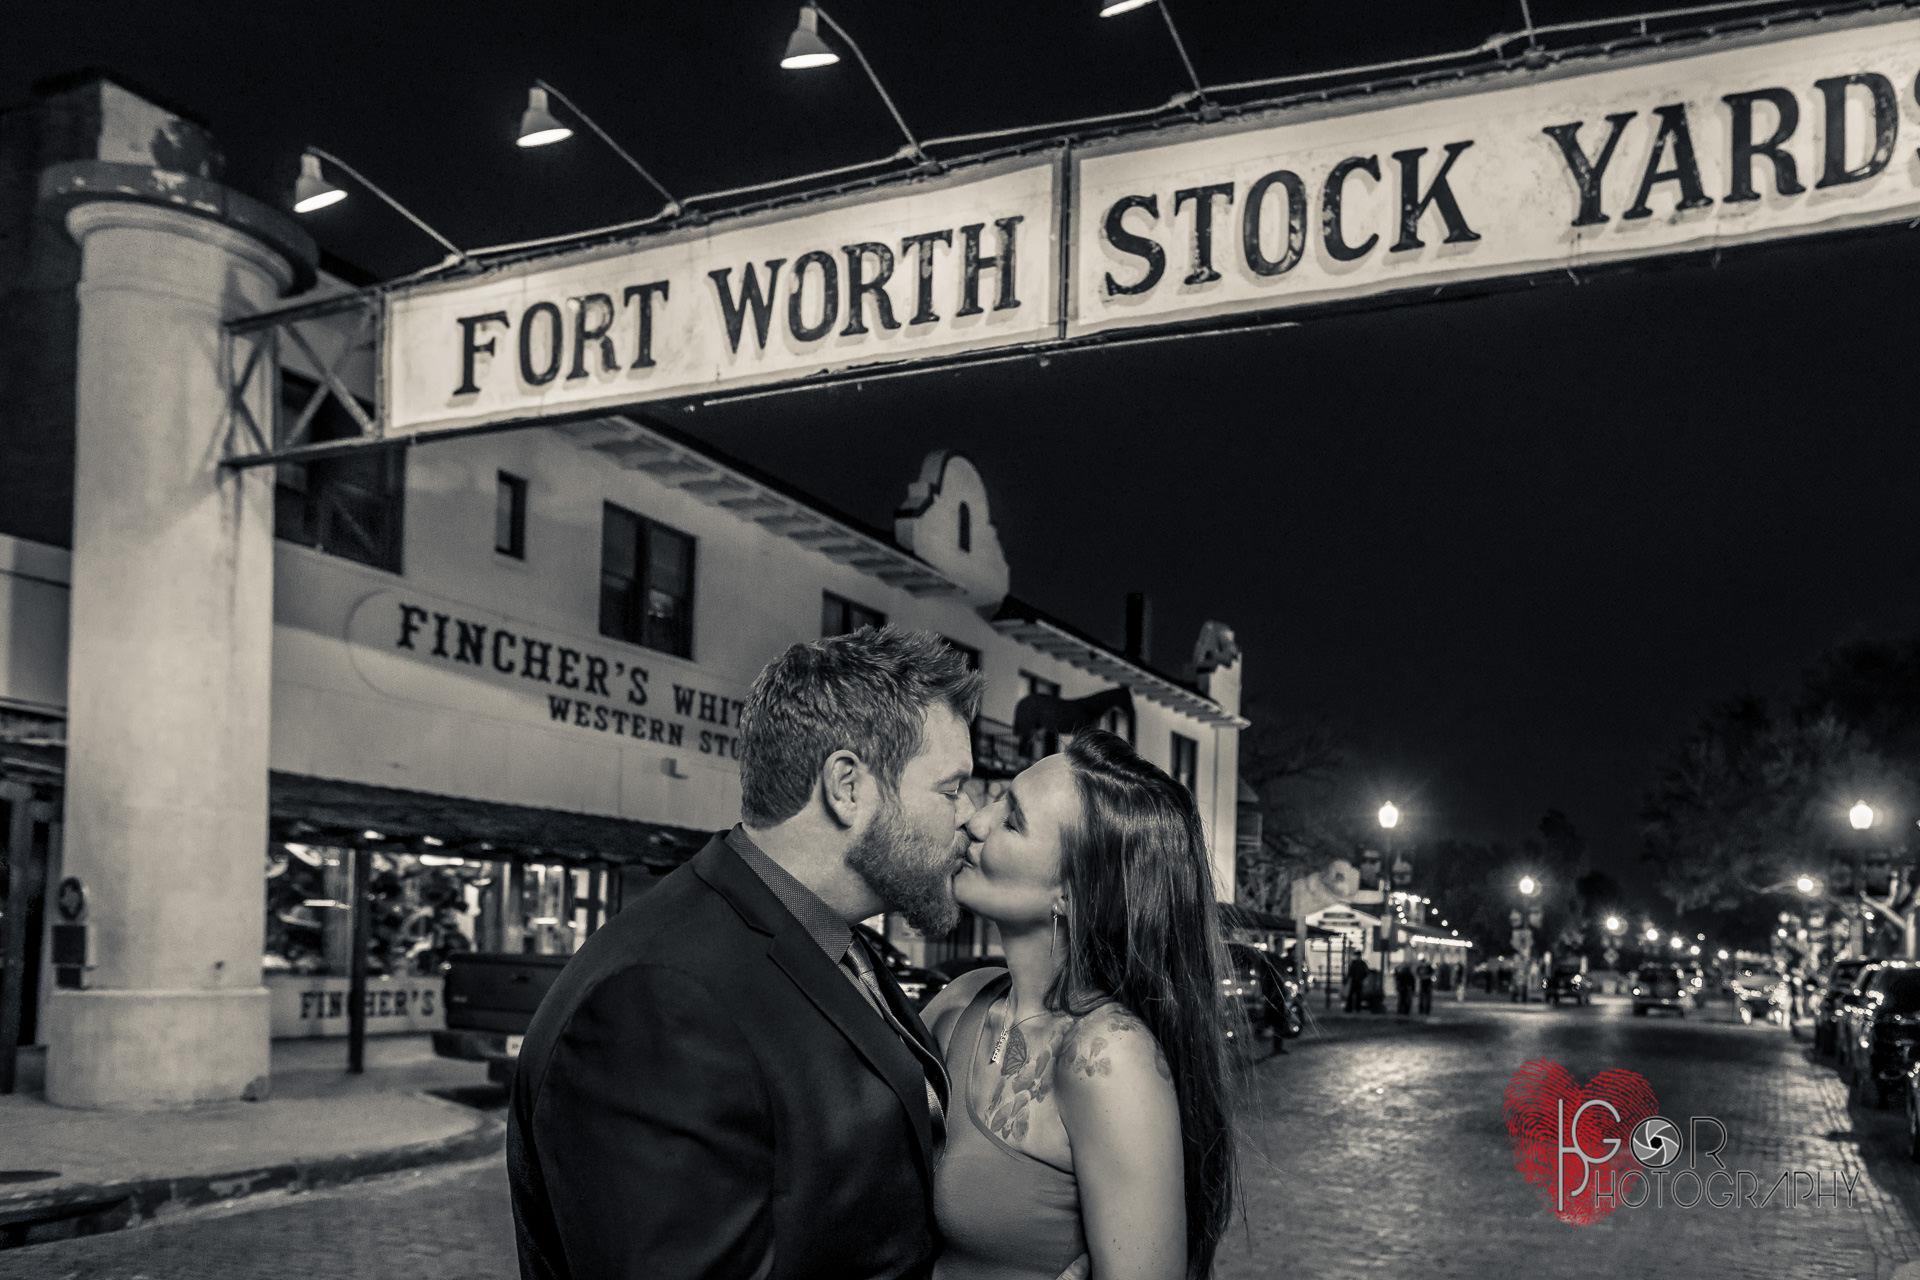 Fort Worth Stockyards Session